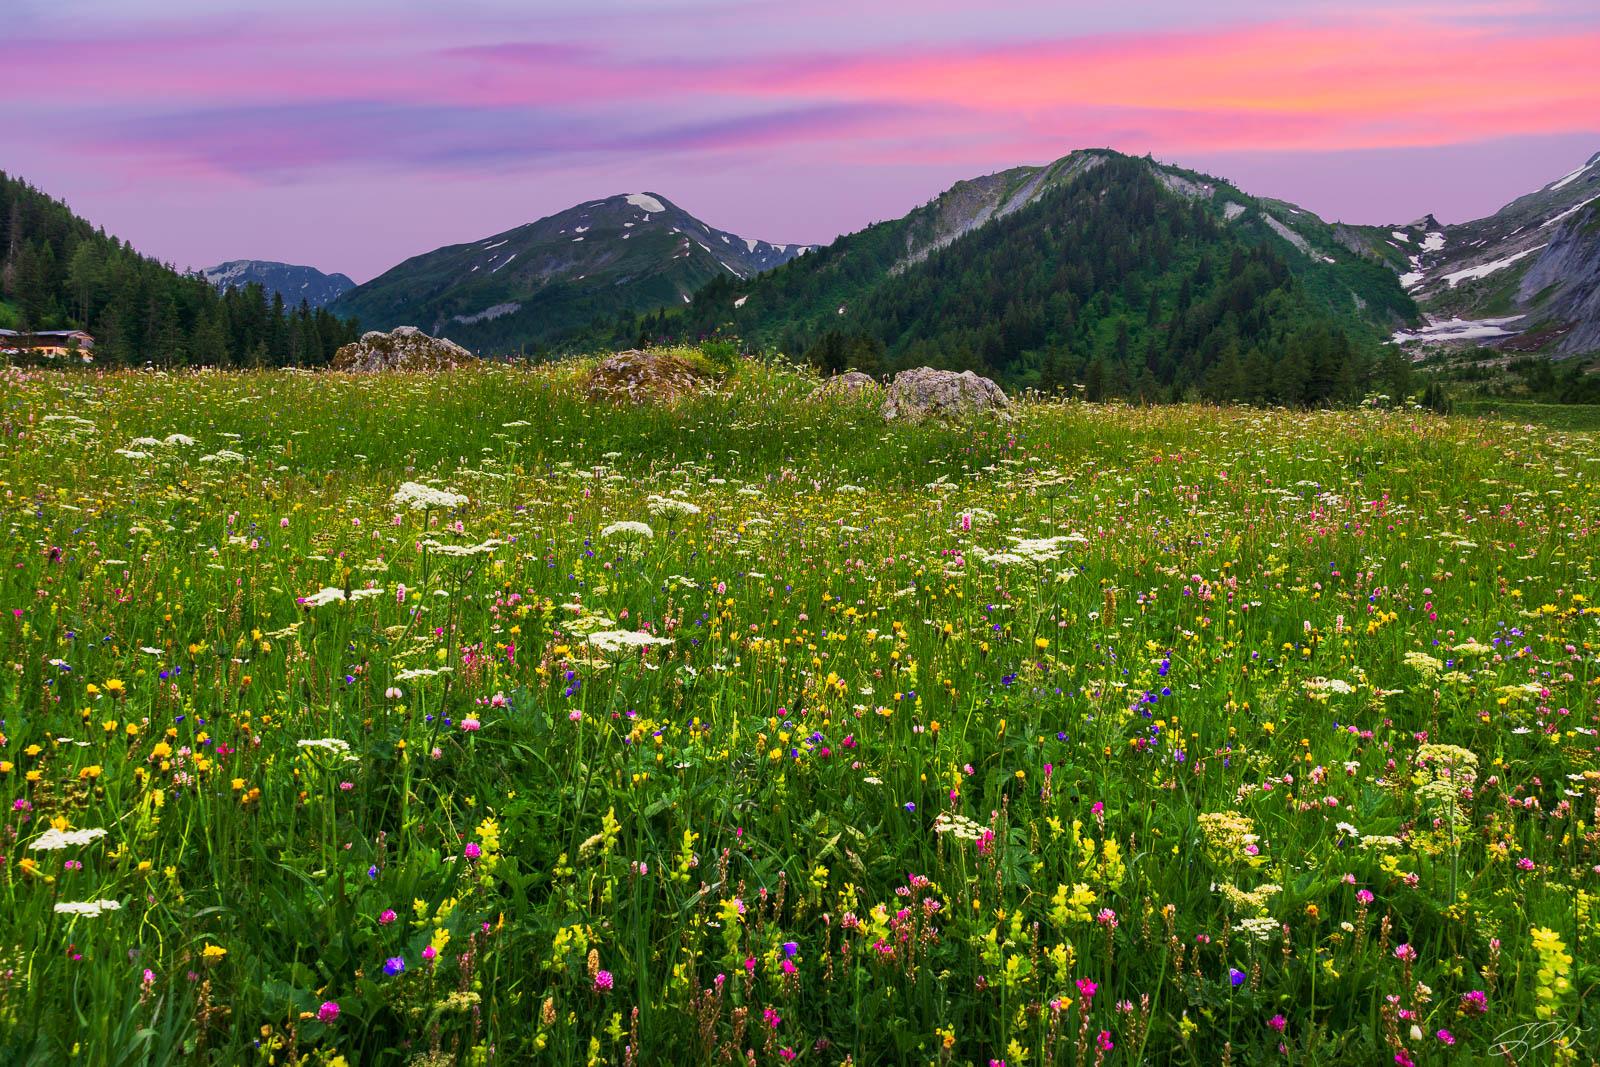 alps, europe, france, italy, switzerland, flowers, wildflowers, backpacking, sunset, tour du mont blanc, photo